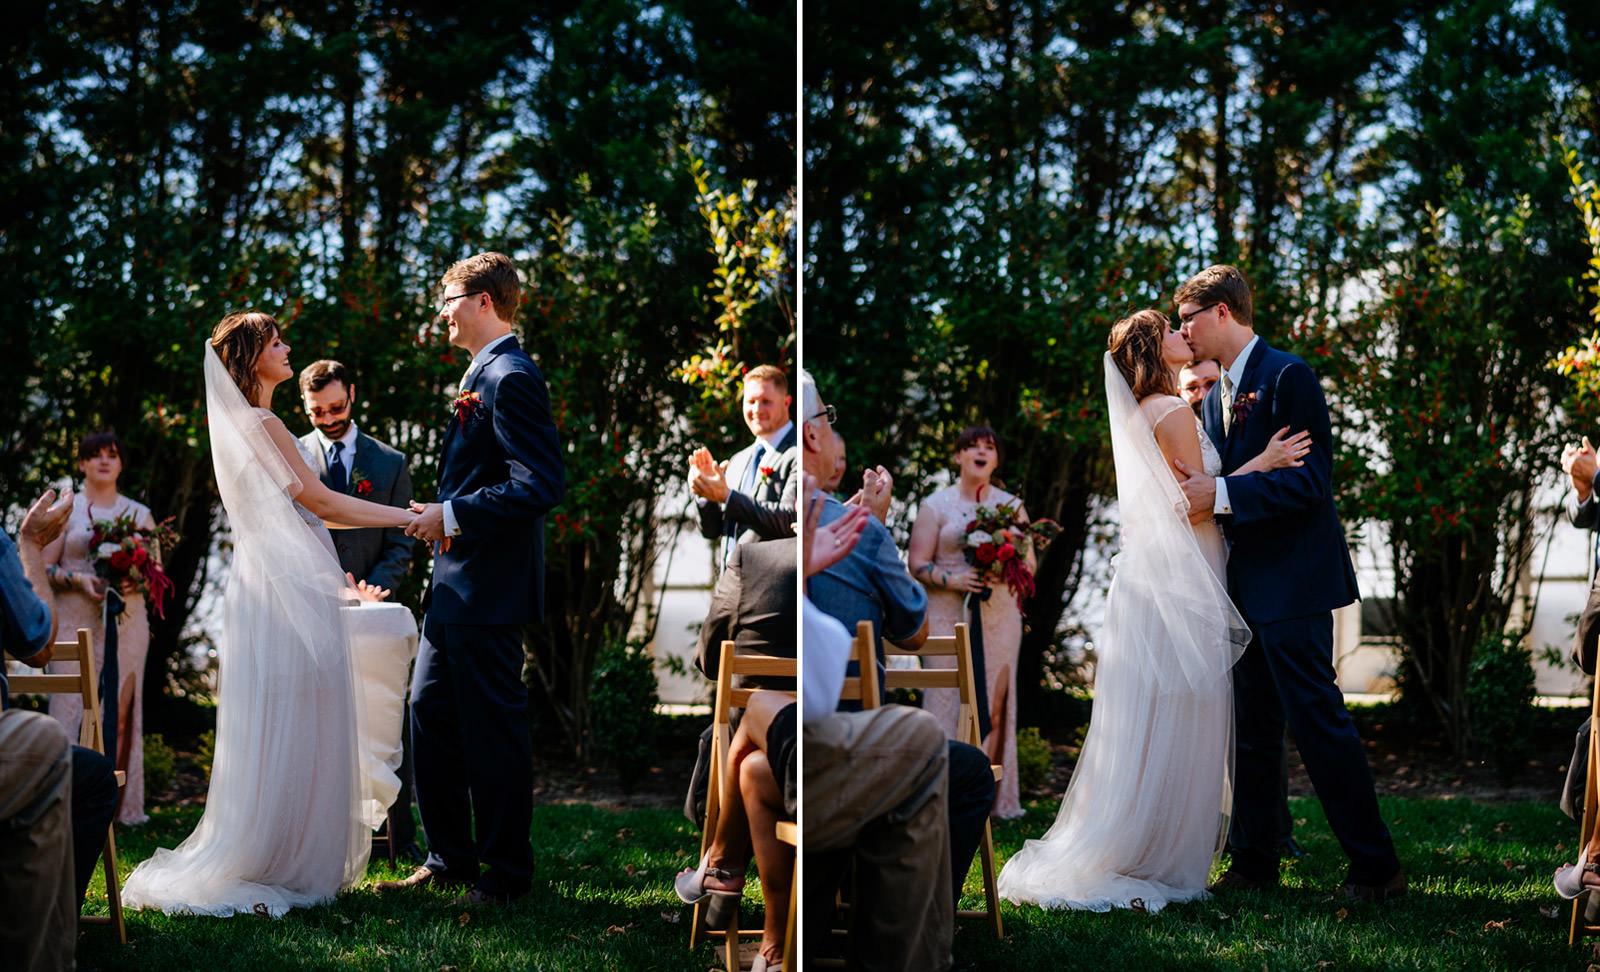 malden wv jq dickinson saltworks wedding